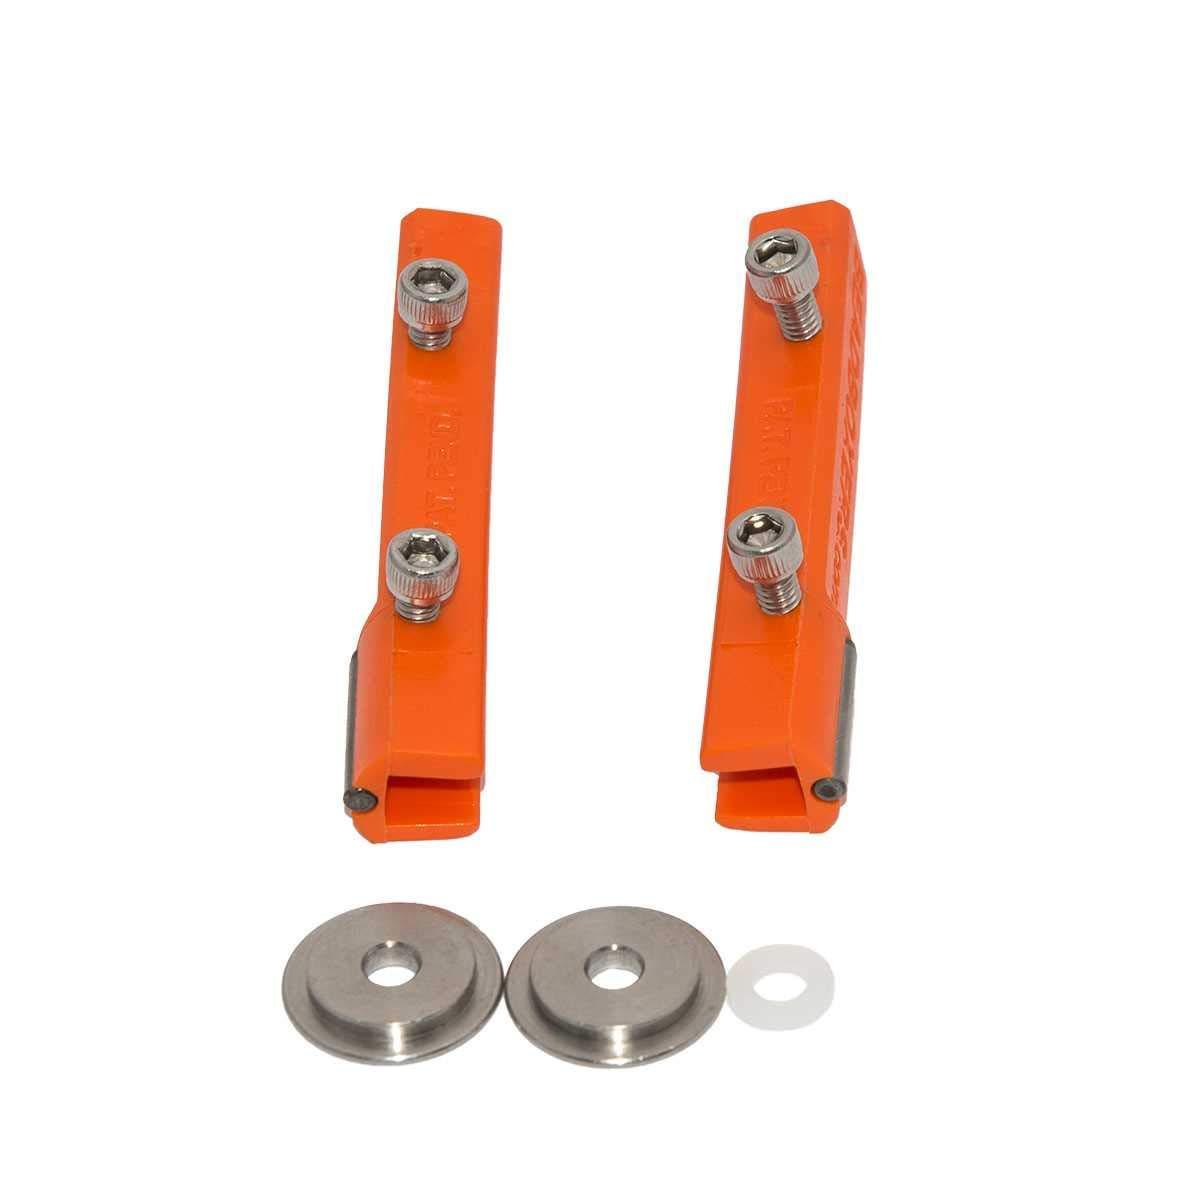 Beadboxers Flat Box Cornerbead Taping Retrofit Kit by Beadboxers (Image #7)